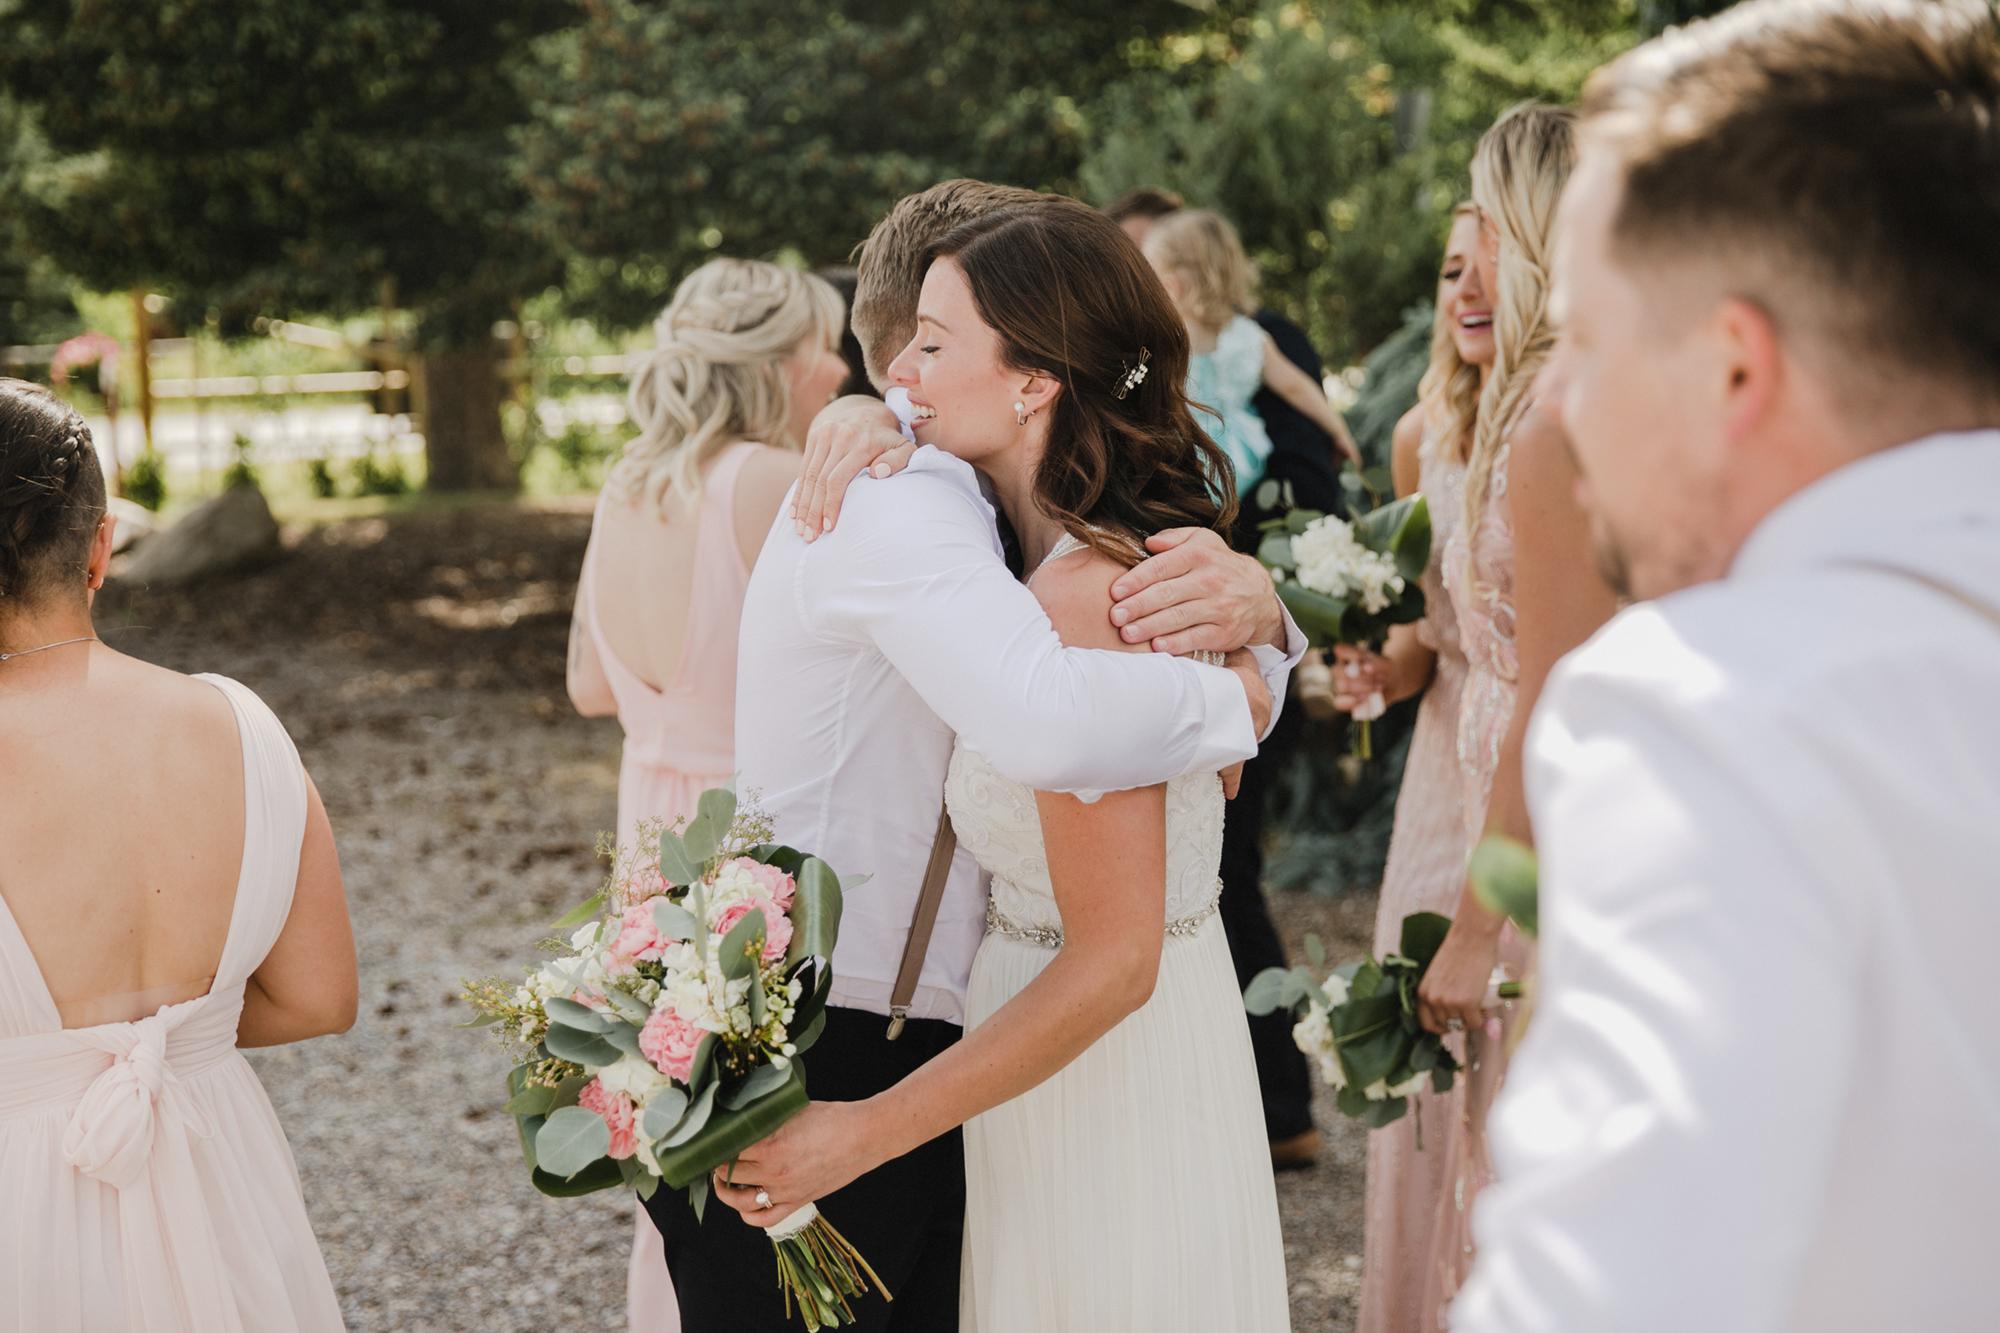 Flower Farm Crowsnest Pass Wedding -065.JPG